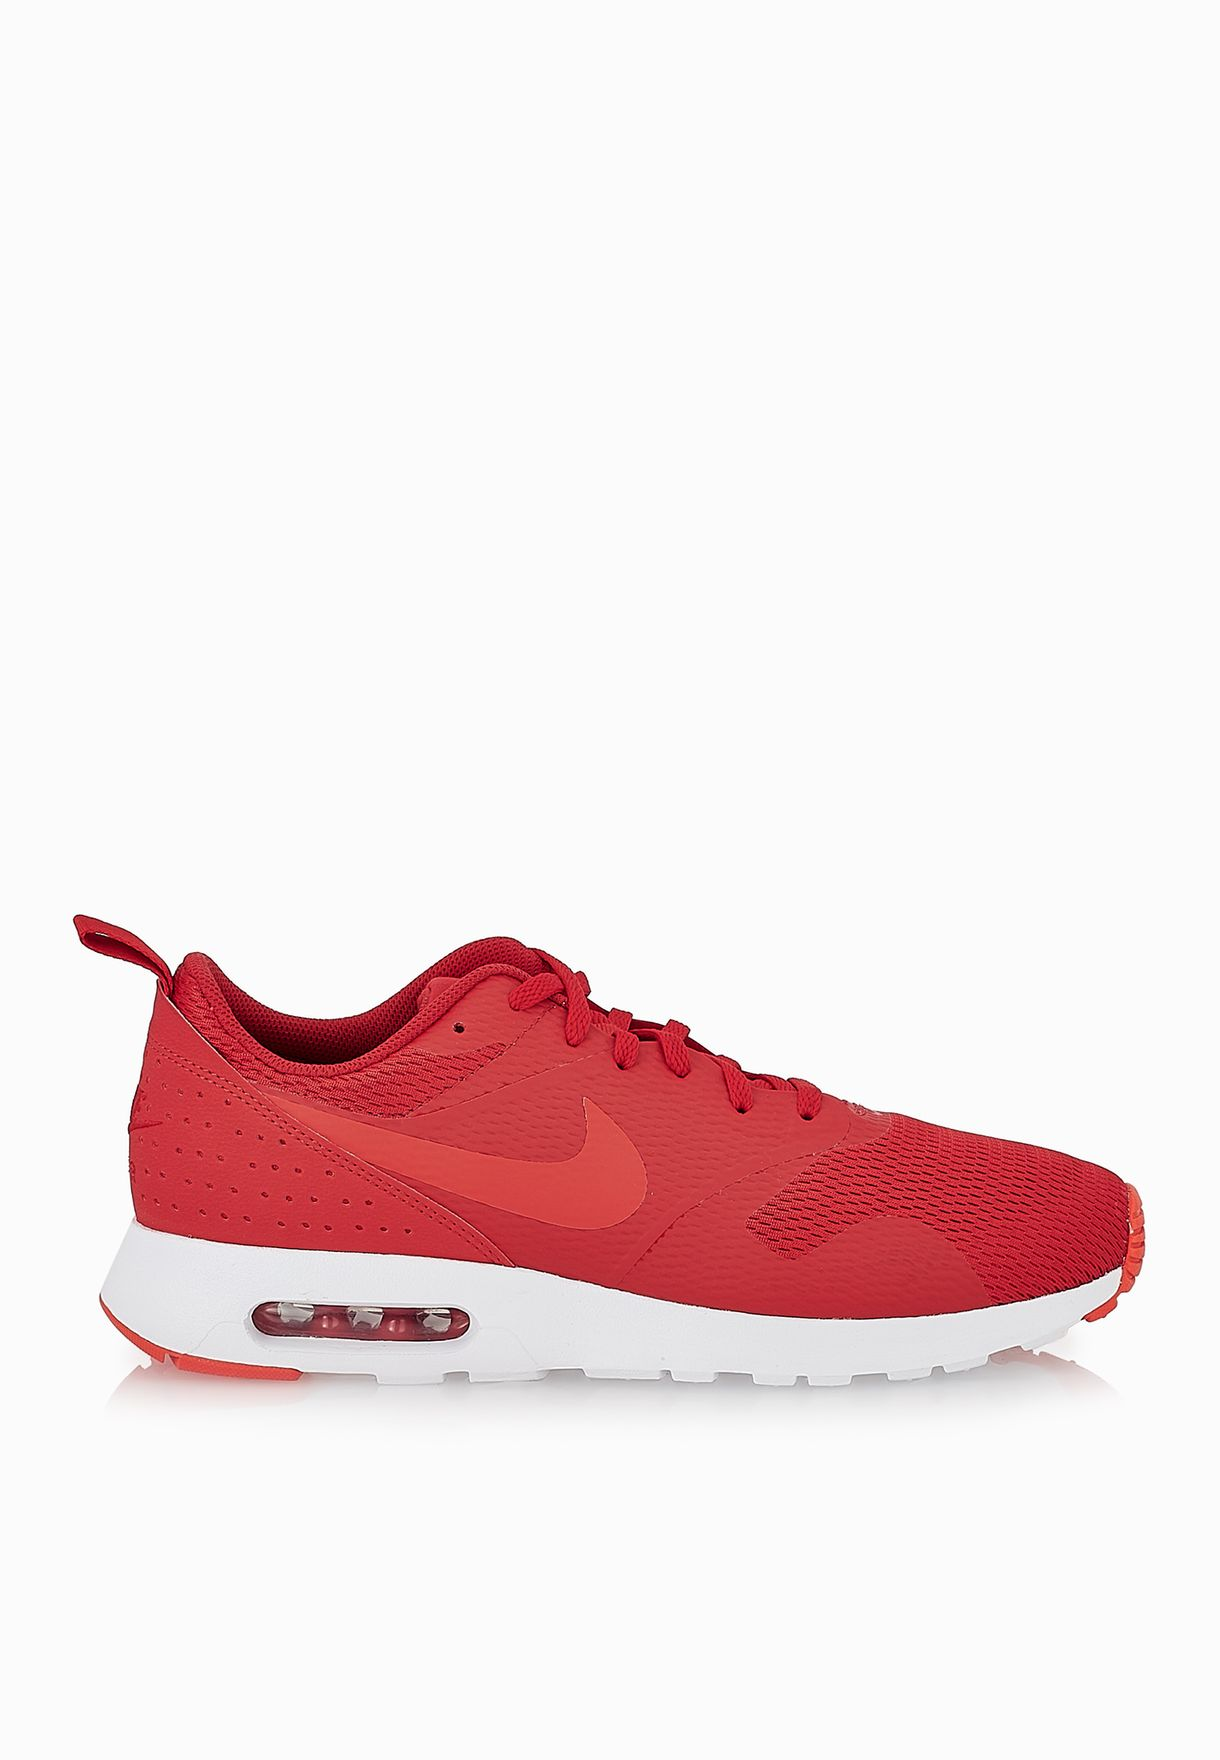 san francisco b3a1c 453ff Shop Nike red Air Max Tavas 705149-602 for Men in Saudi - NI